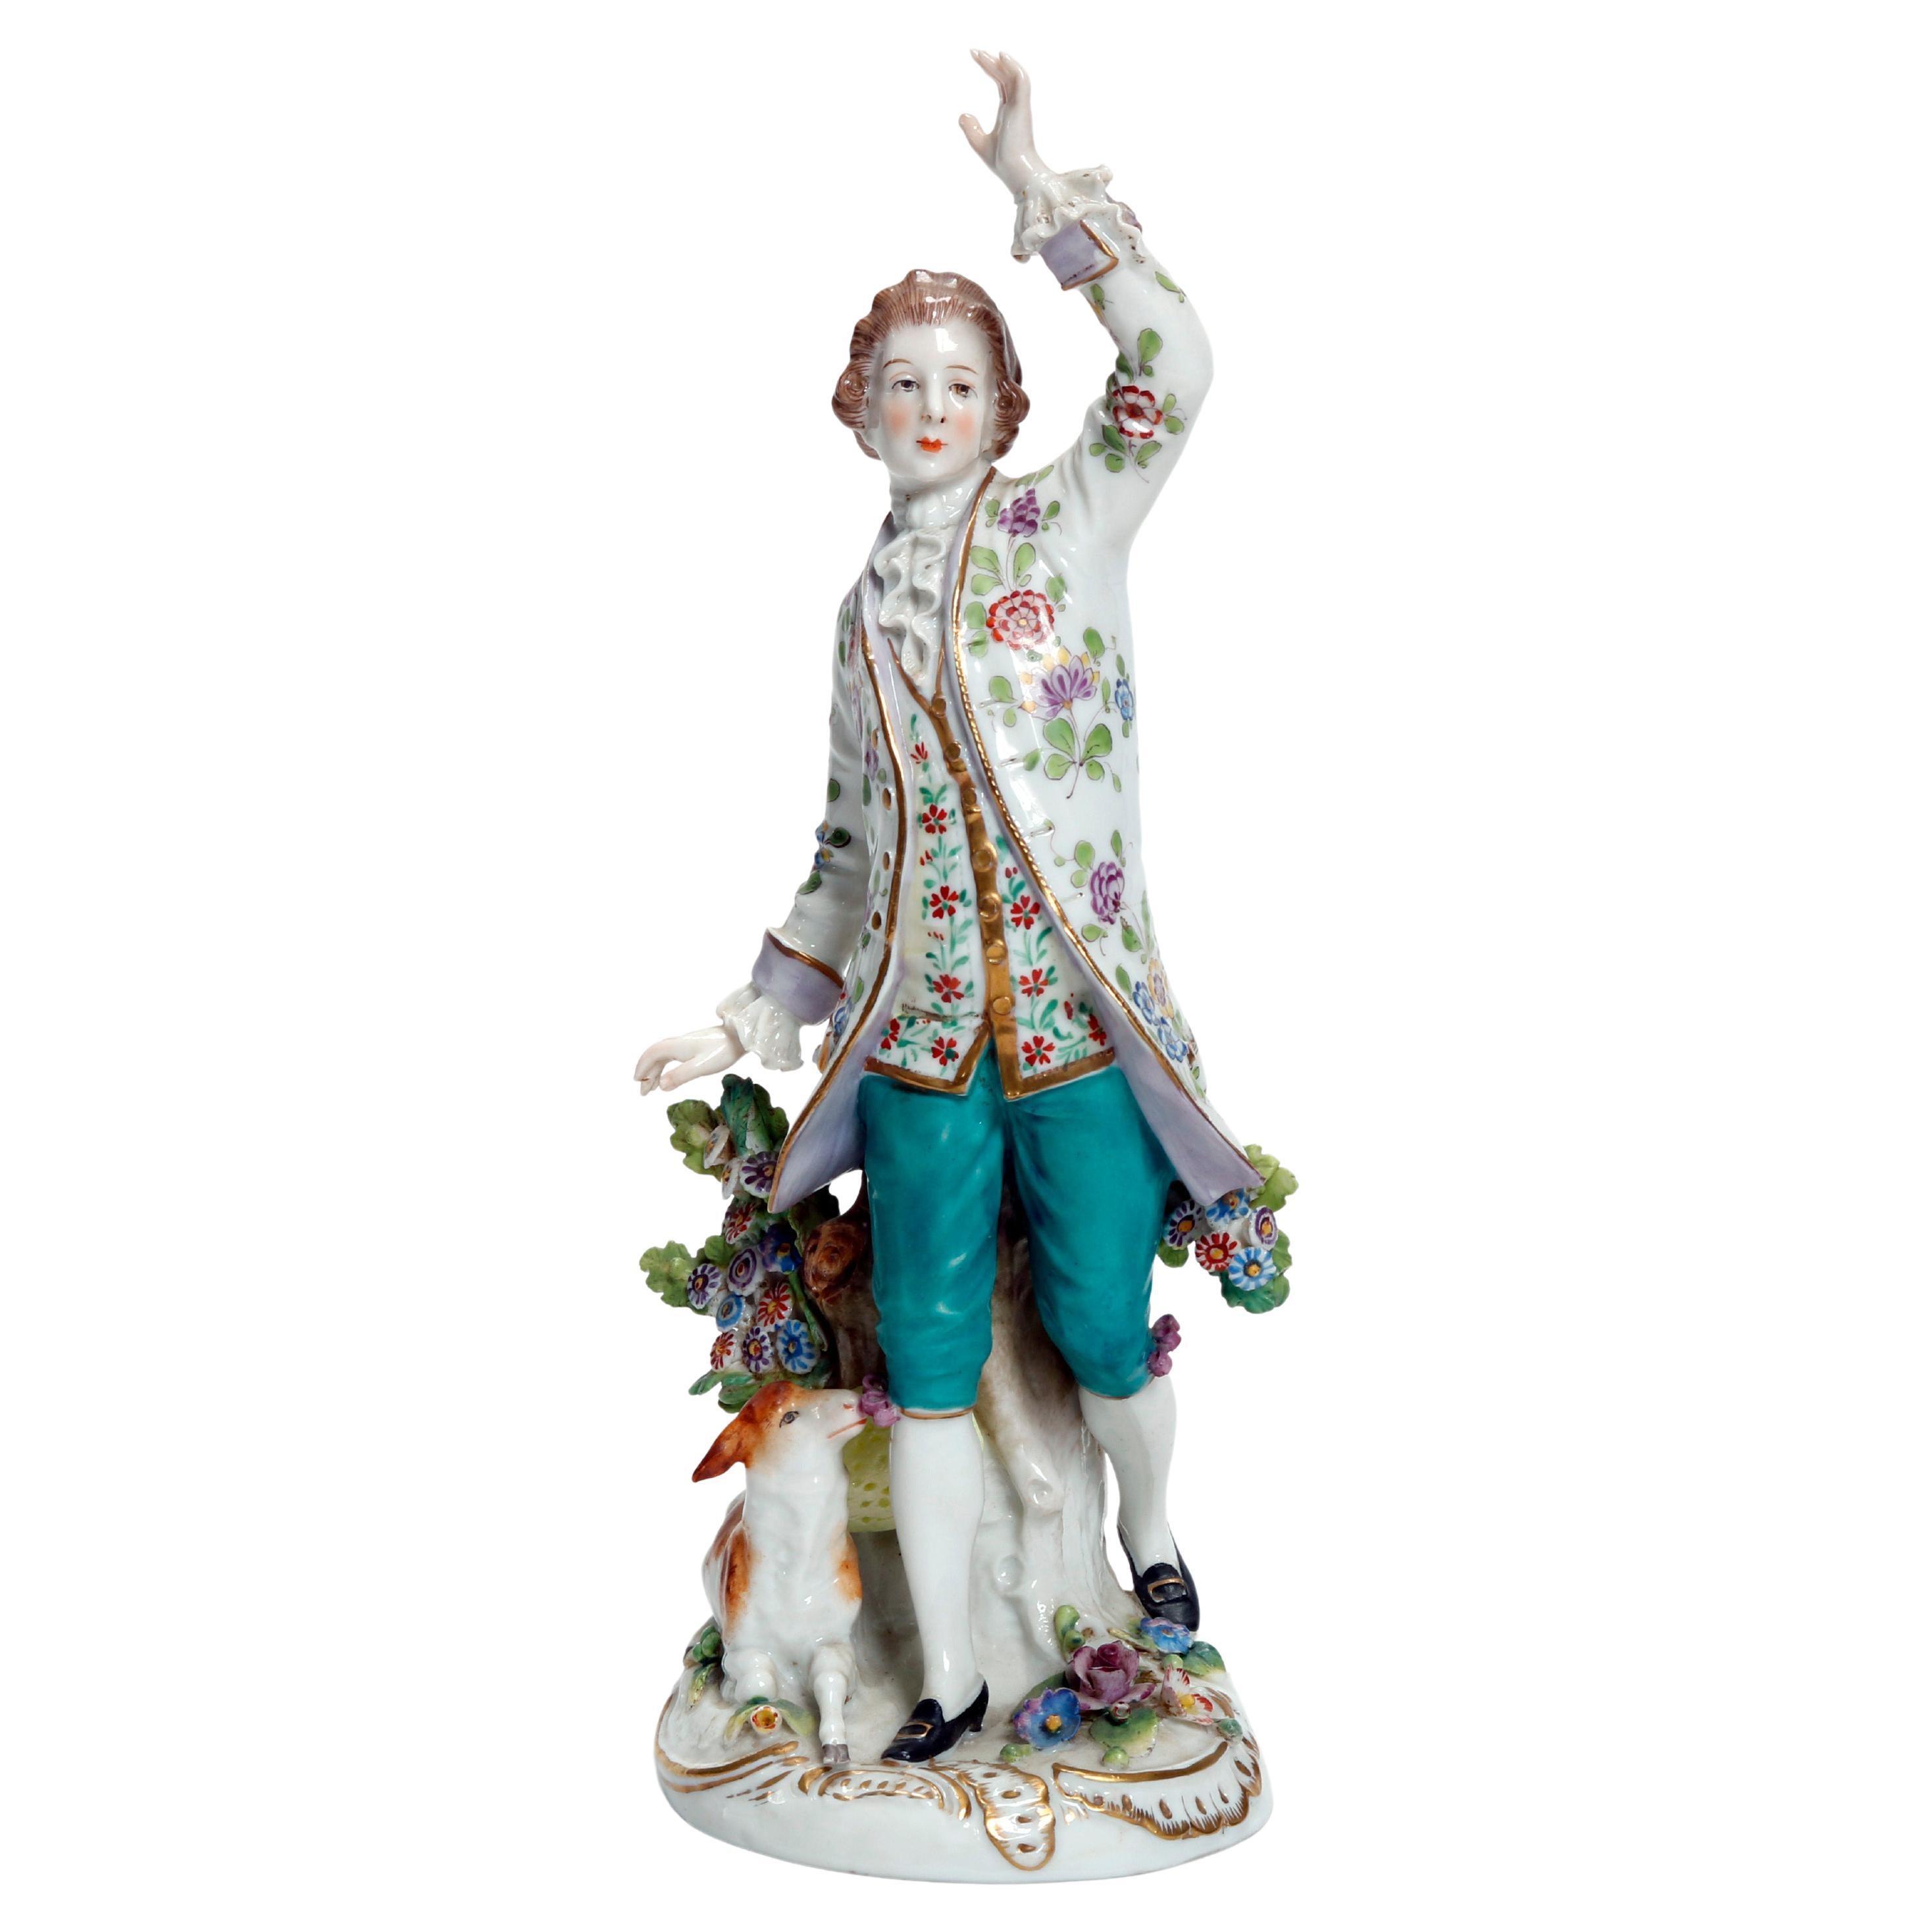 Antique English Chelsea Hand Painted & Gilt Porcelain Figure, Boy & Sheep 19th C